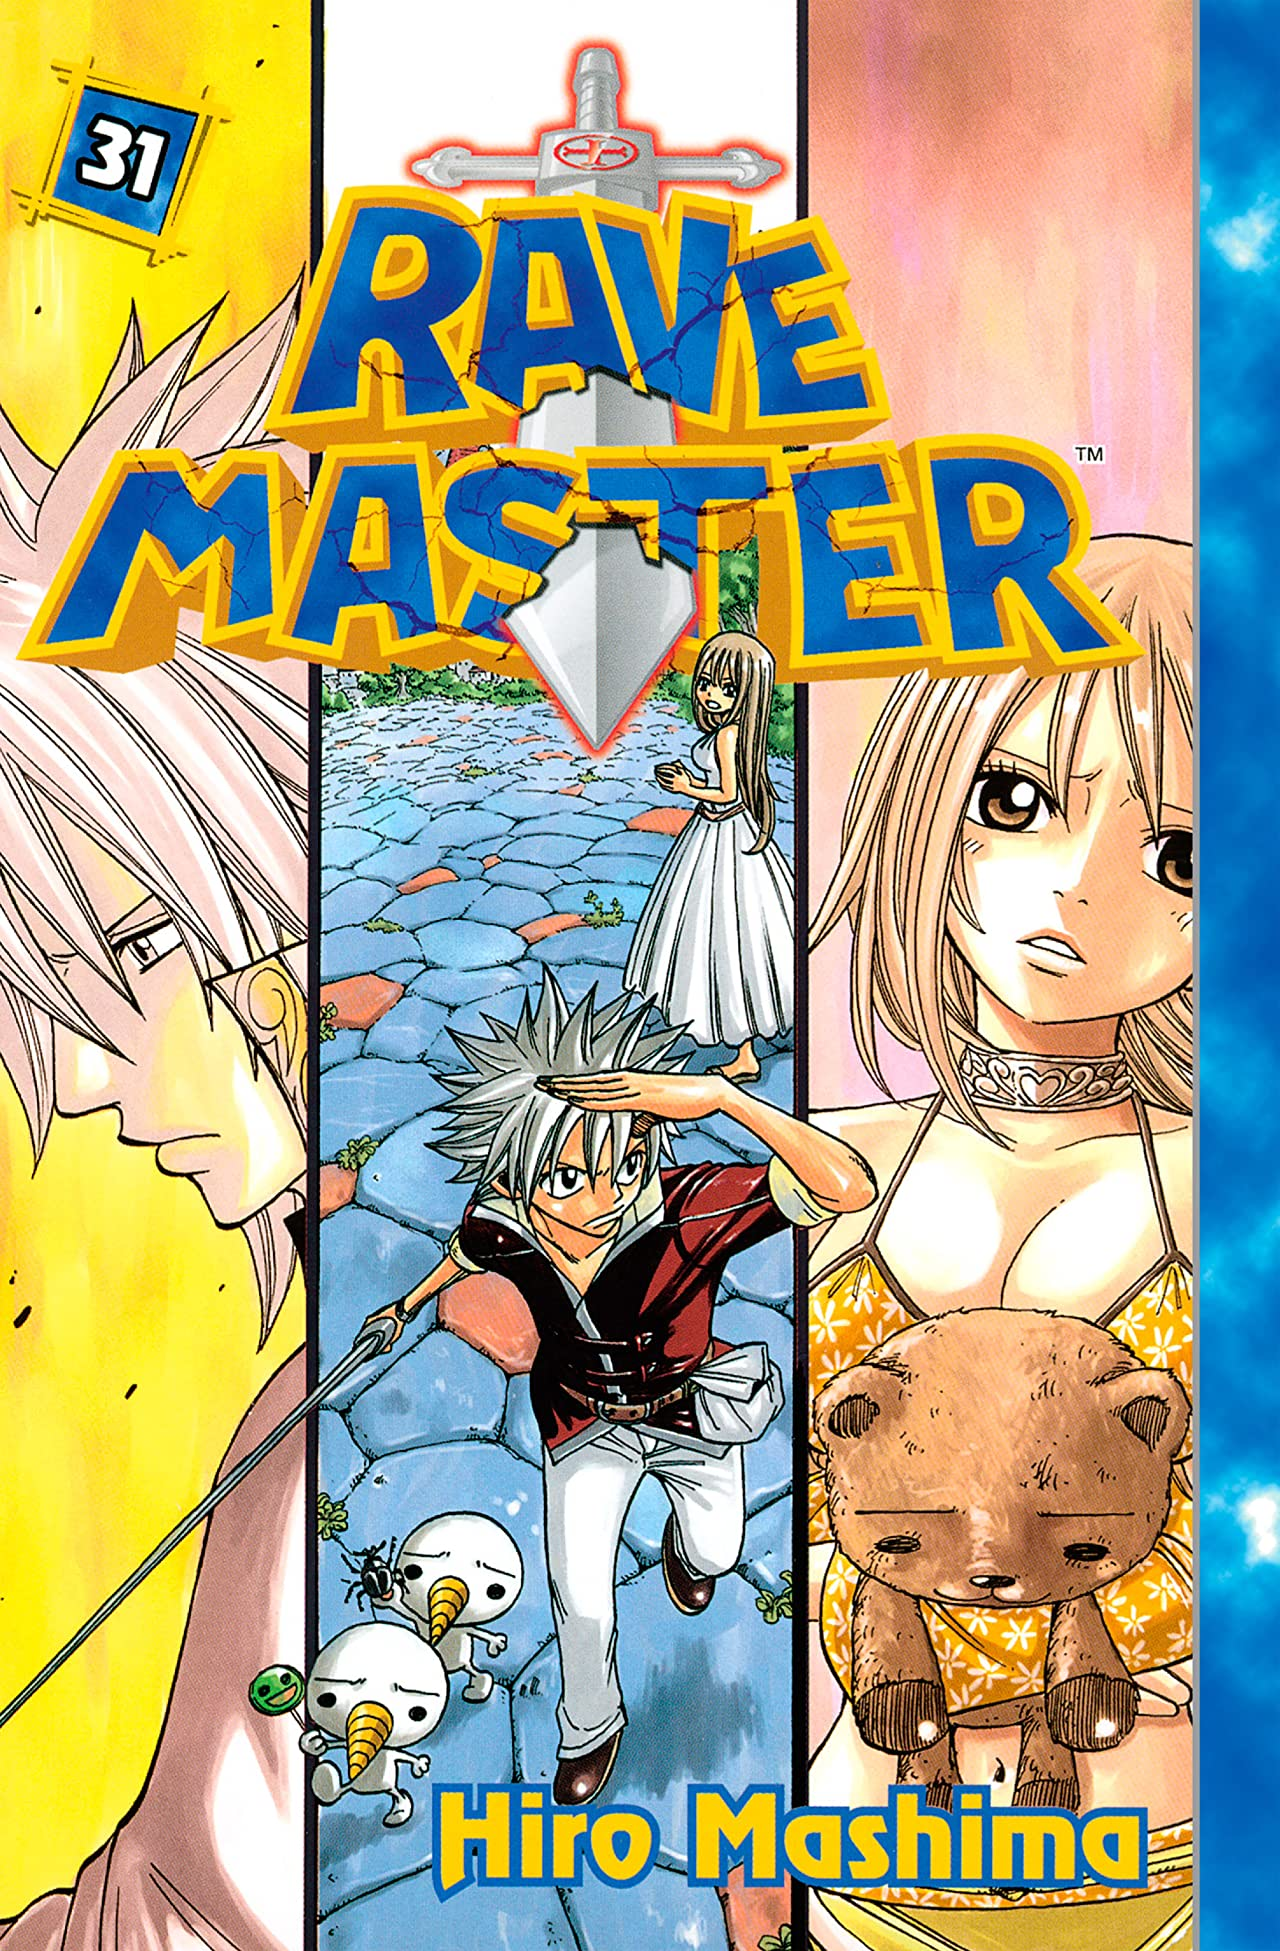 Rave Master Vol. 31